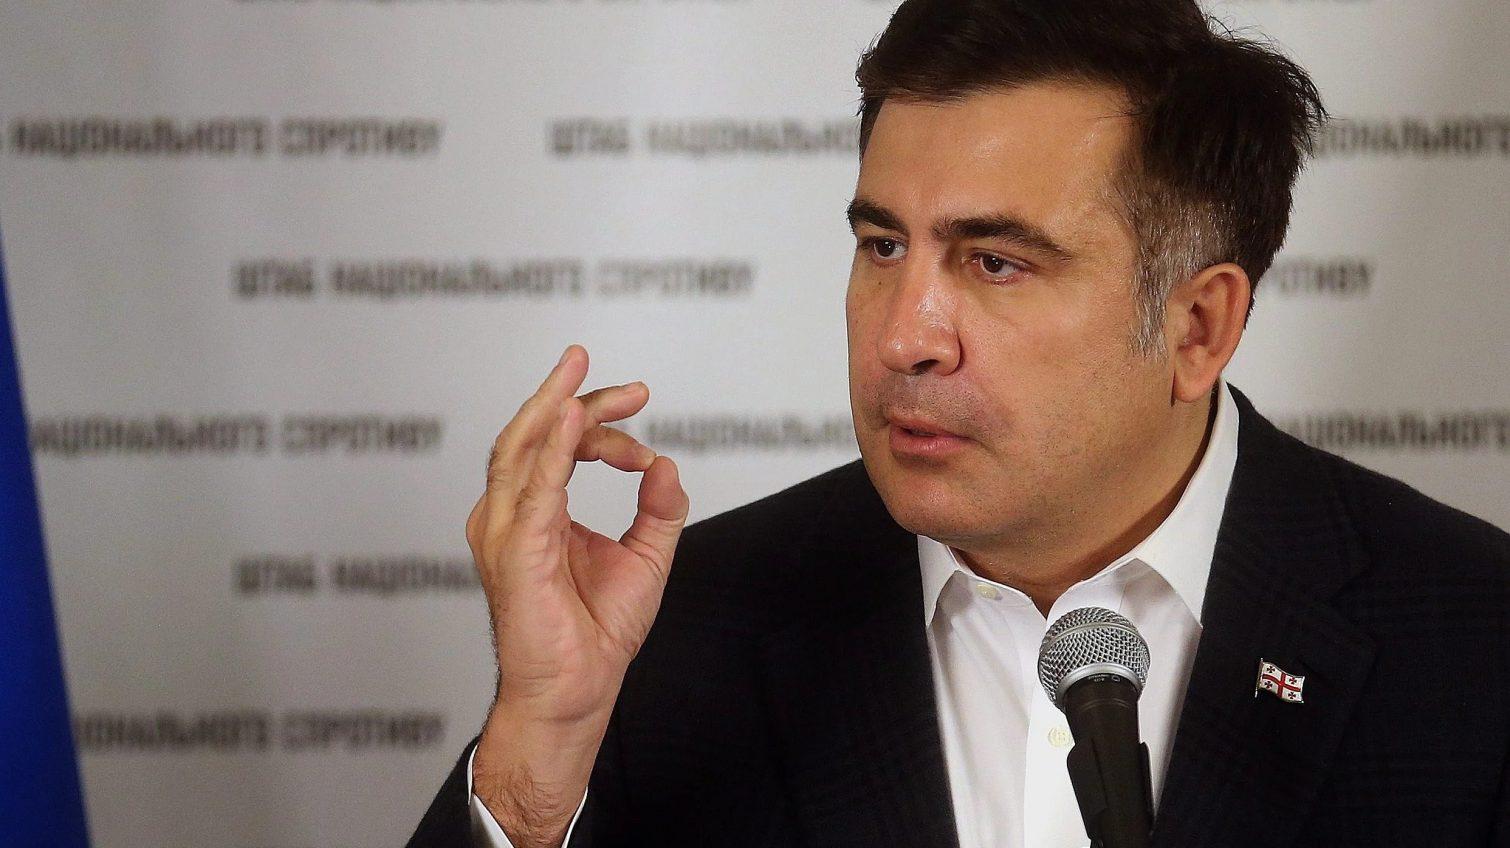 Михеила Саакашвили могут назначить вице-премьером «фото»